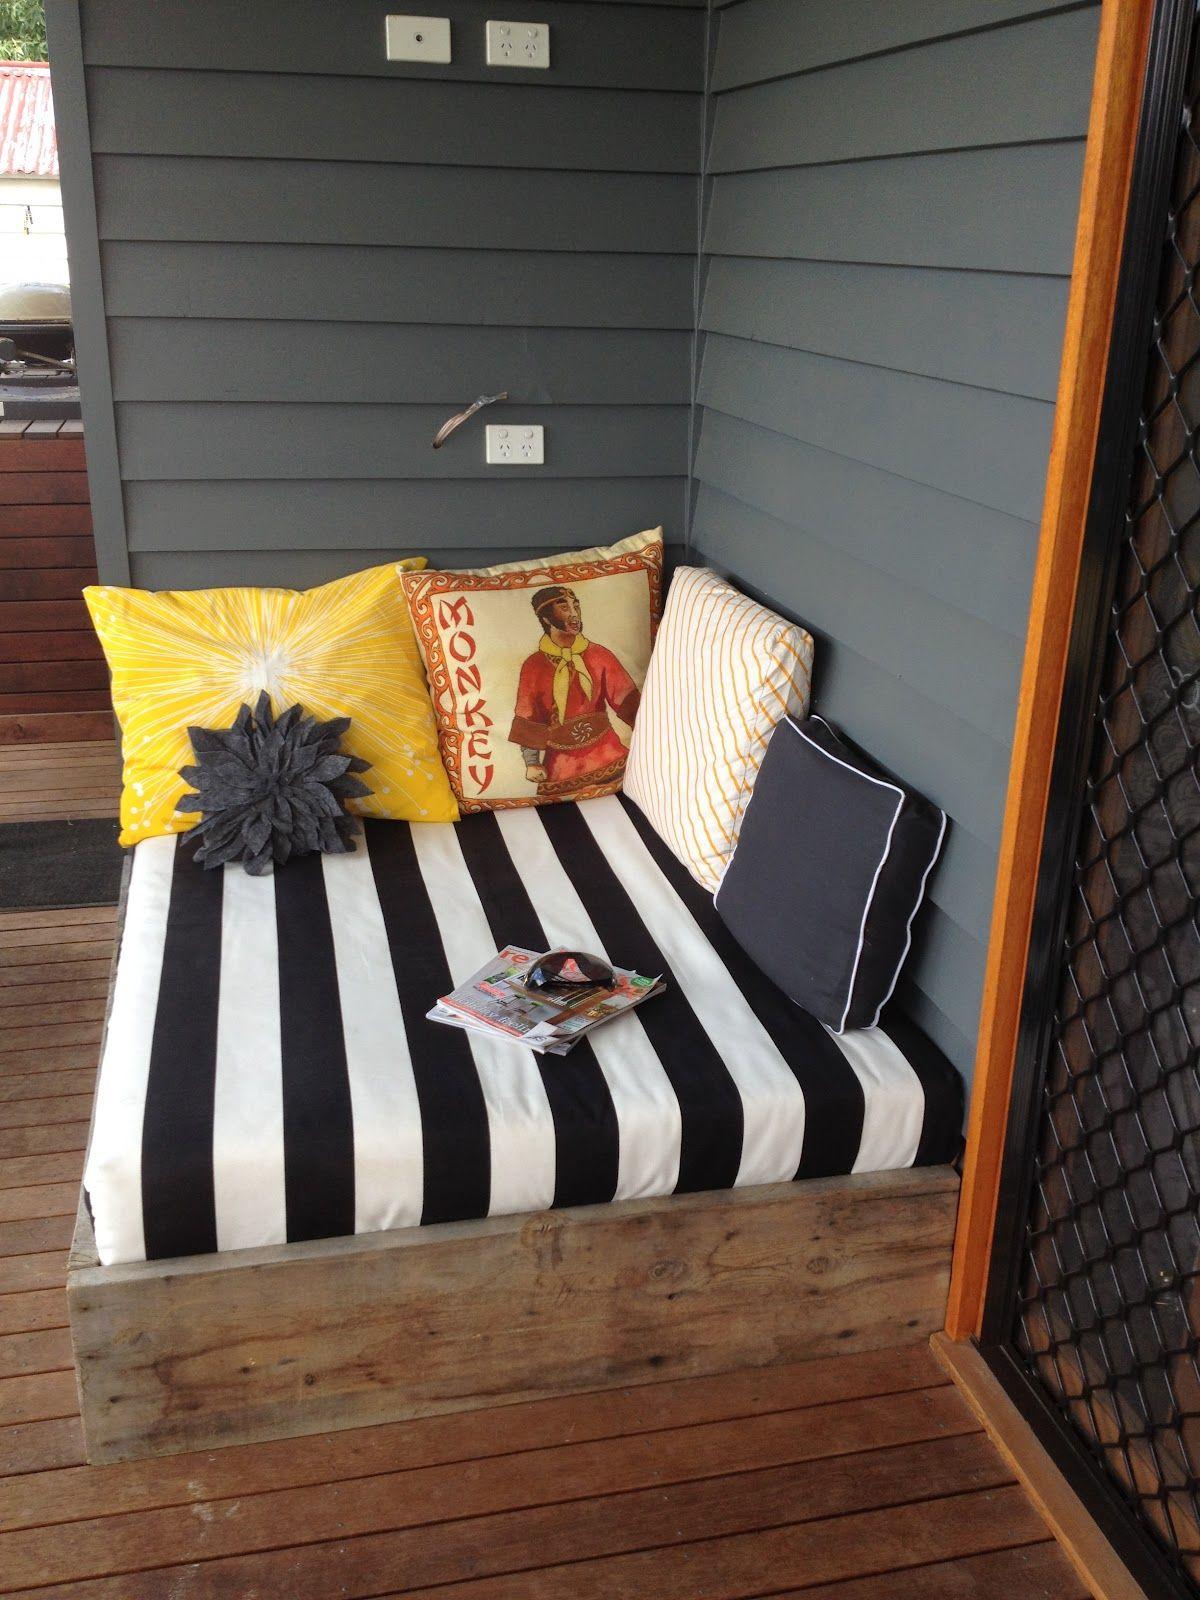 Apprentice extrovert diy outdoor day bed reveal do it yourself apprentice extrovert diy outdoor day bed reveal solutioingenieria Images